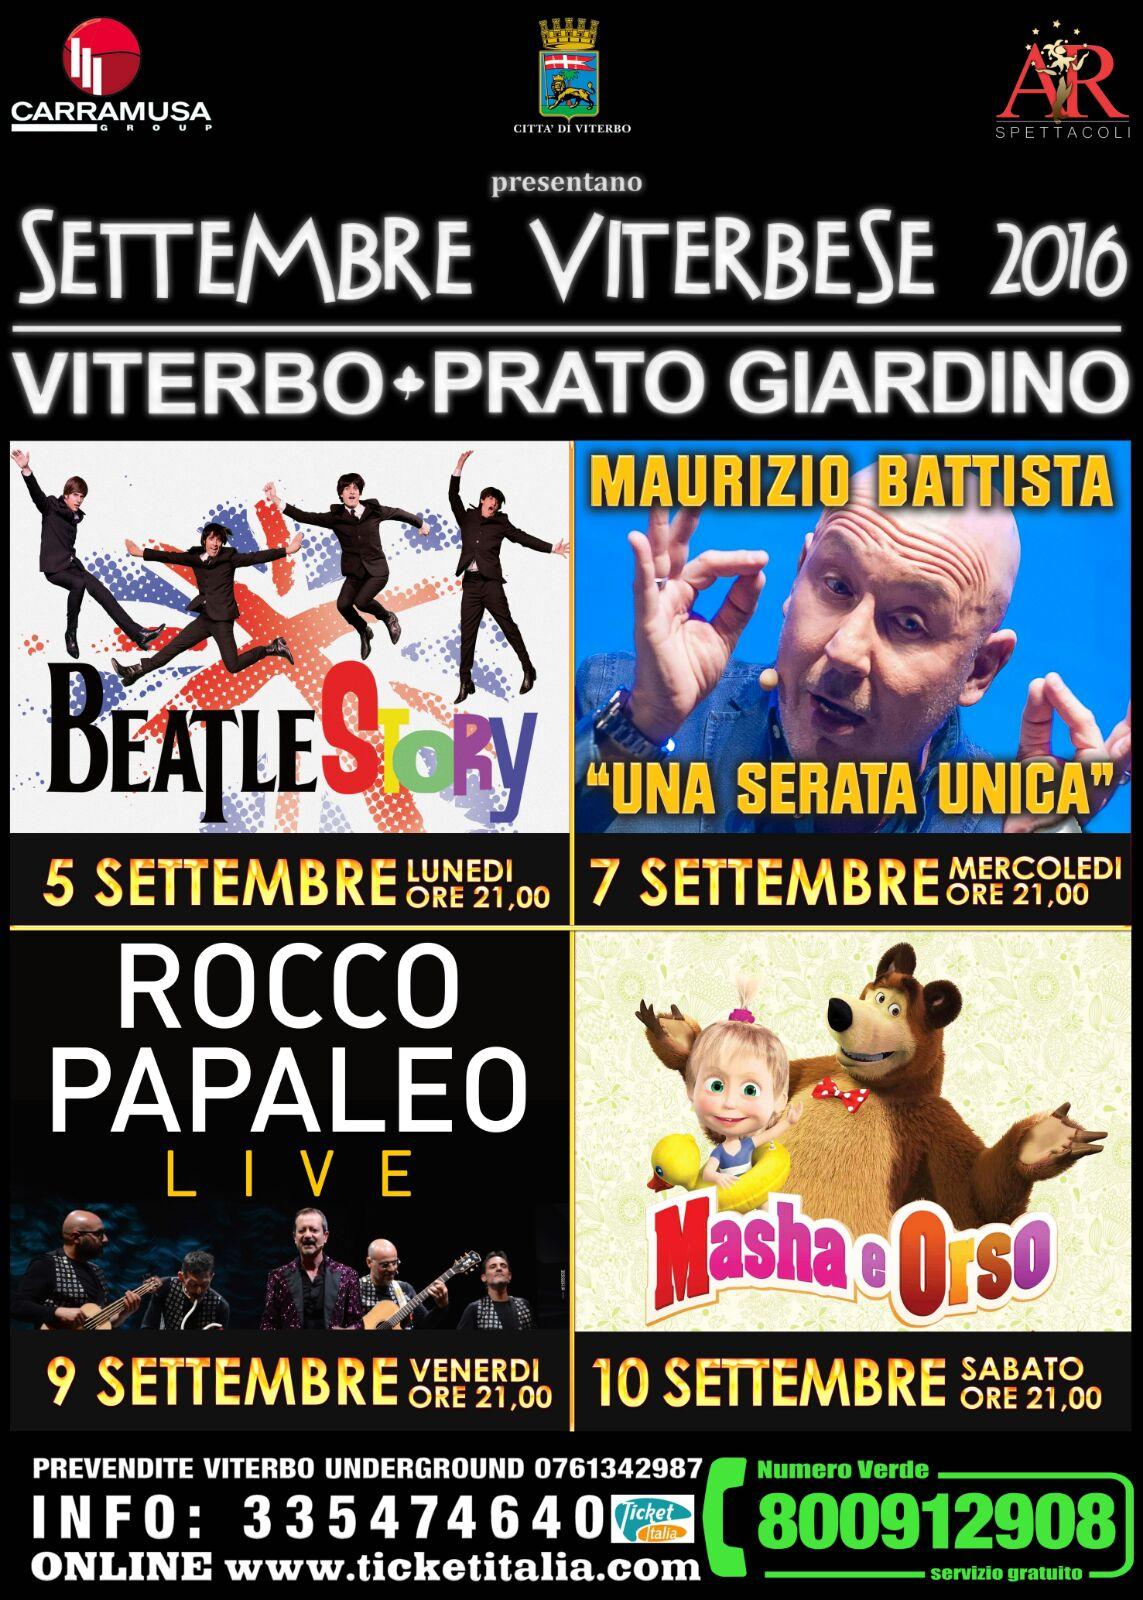 Beatles, Battista, Papaleo e Masha e Orso, poker d'assi per il Settembre Viterbese